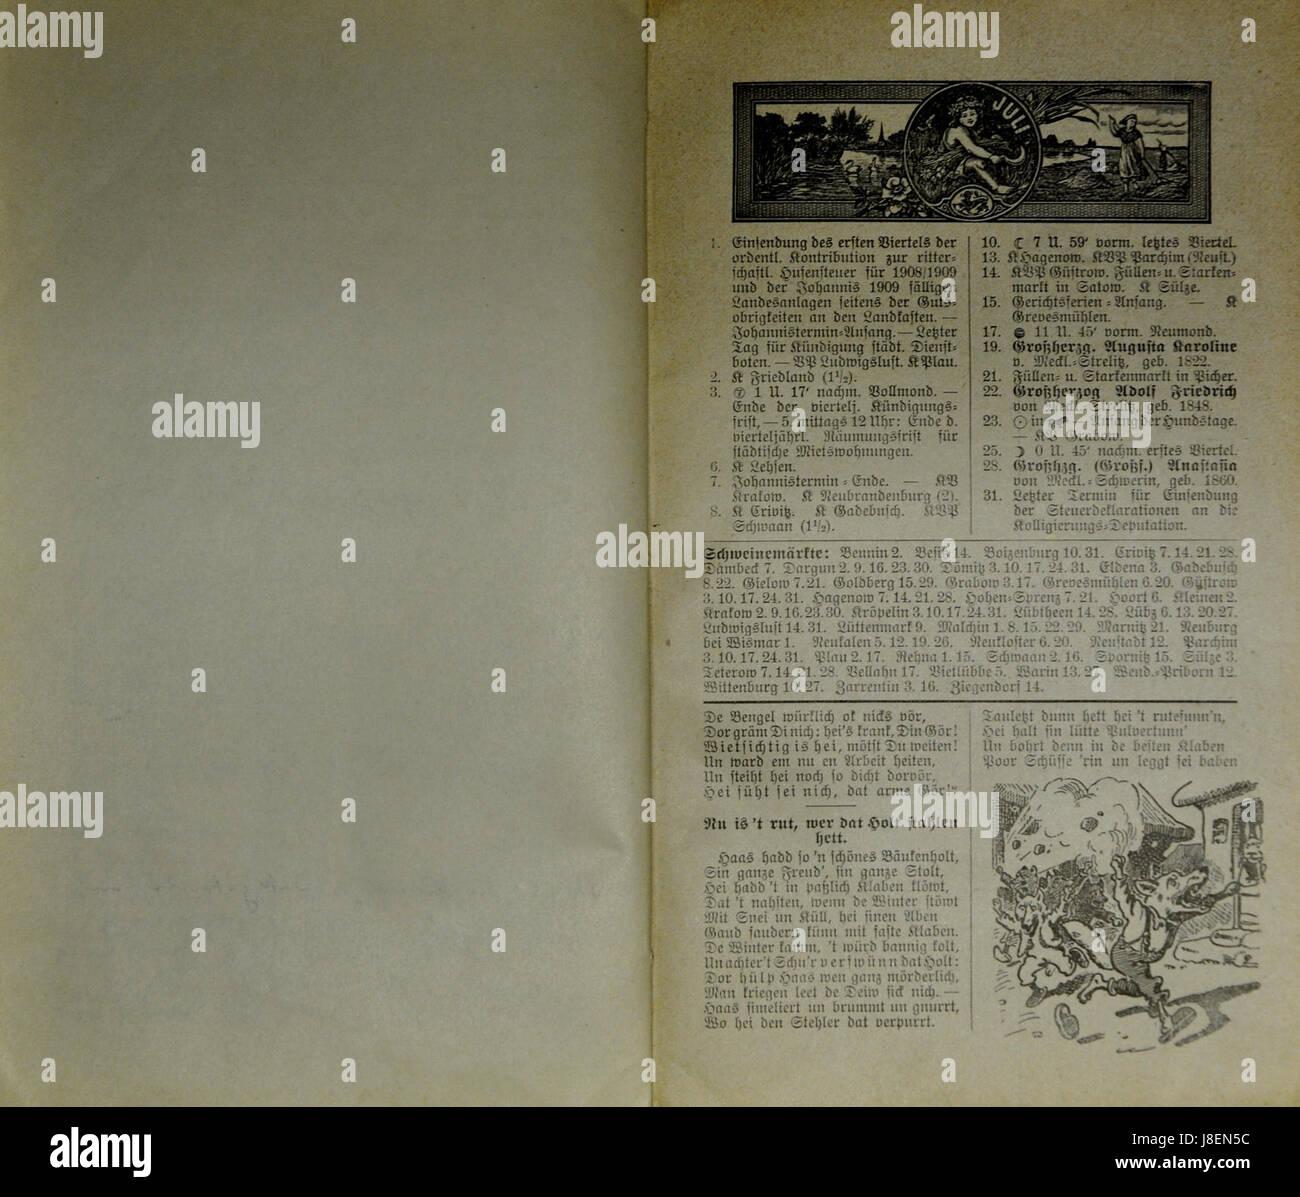 Mecklenburgischer Kalender 1909 016 Stock Photo